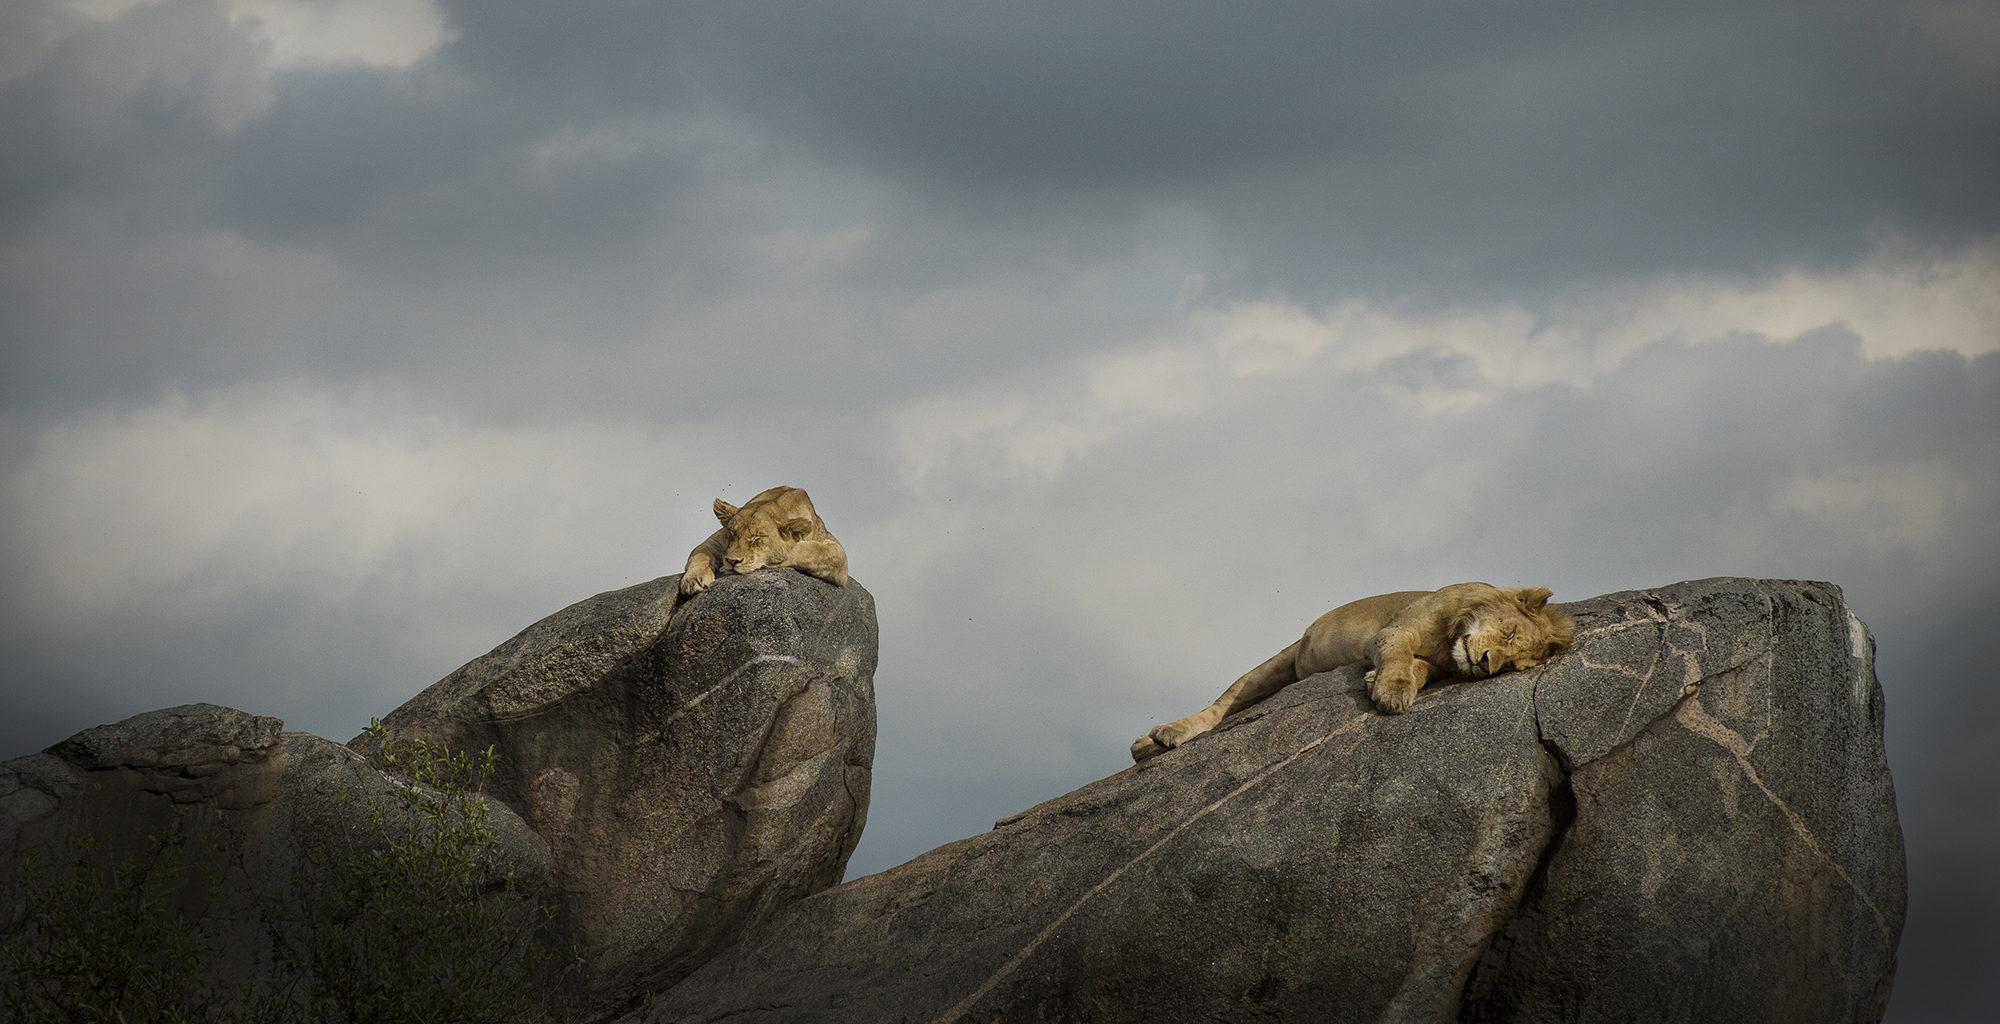 Tanzania-Serengeti-National-Park-Lions